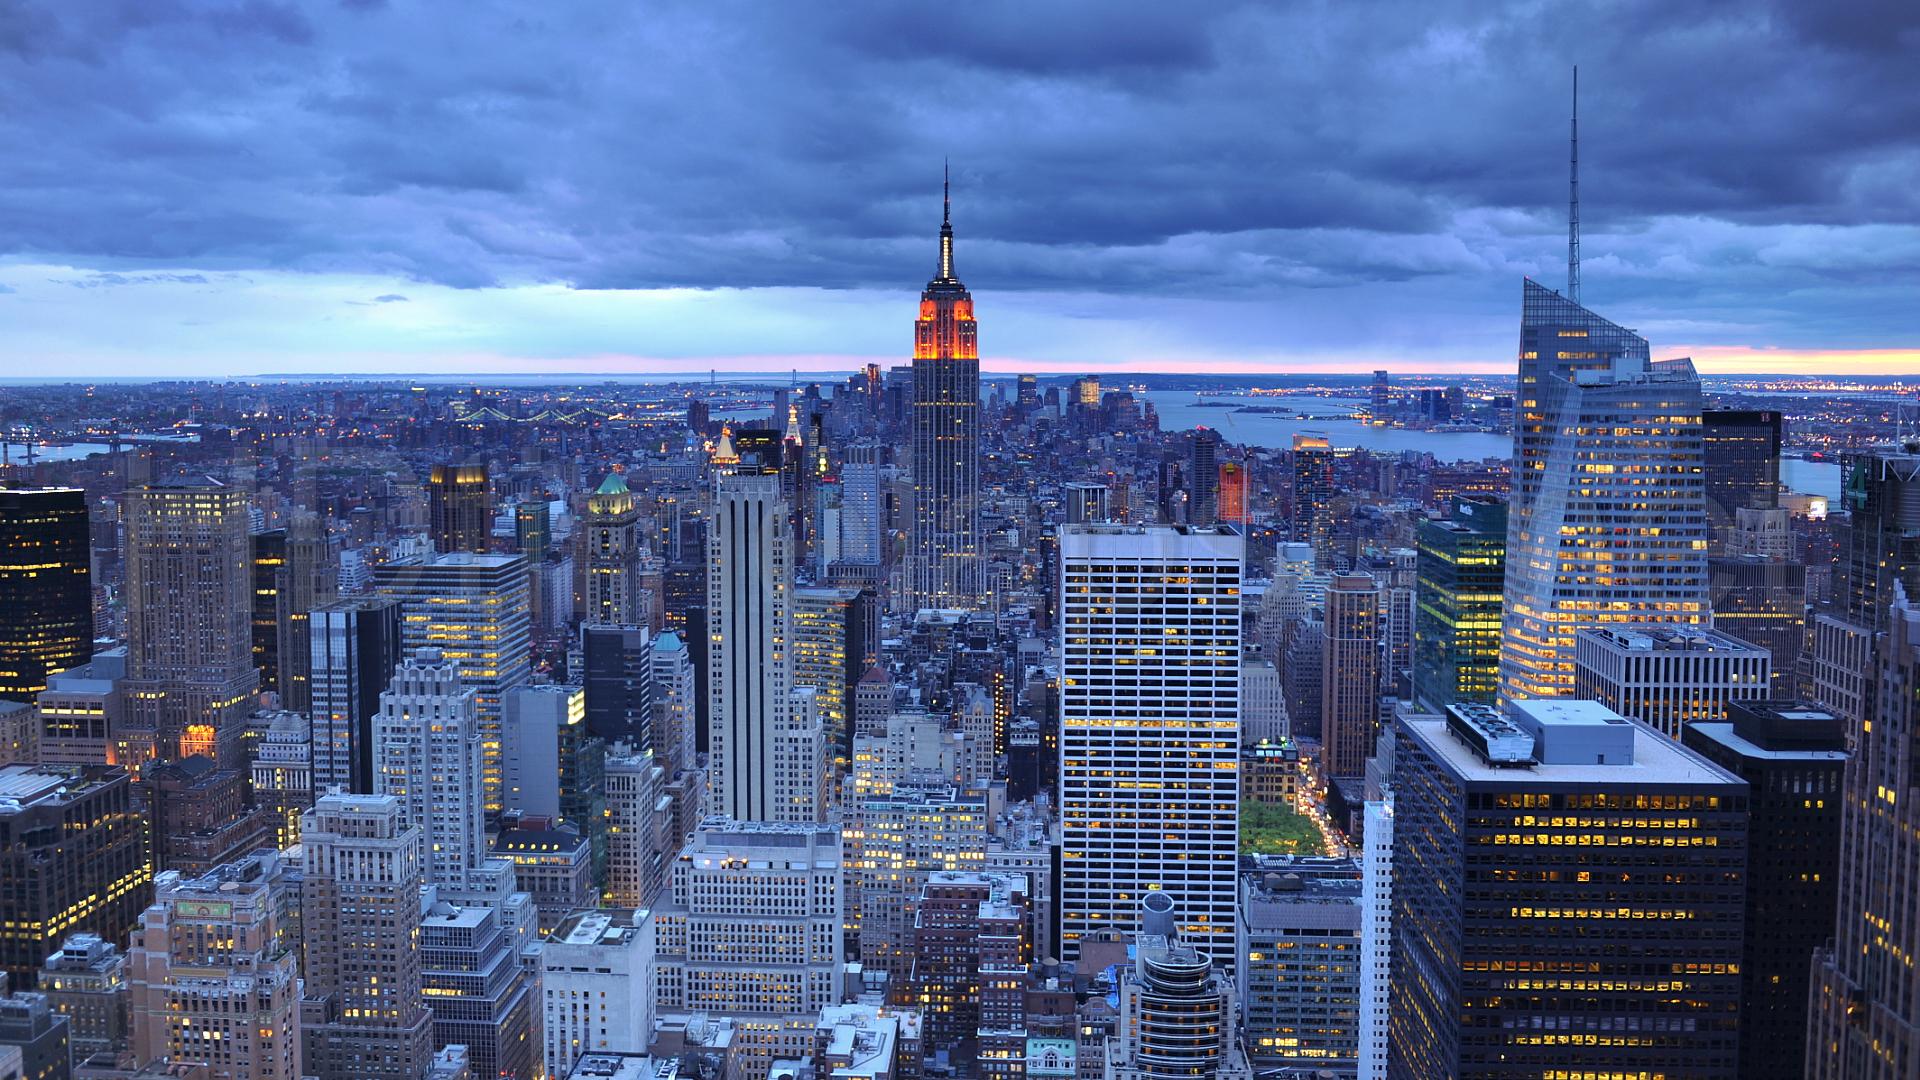 Free New York City USA America skyline HD Desktop wallpapers backgrounds wall murals downloads A12